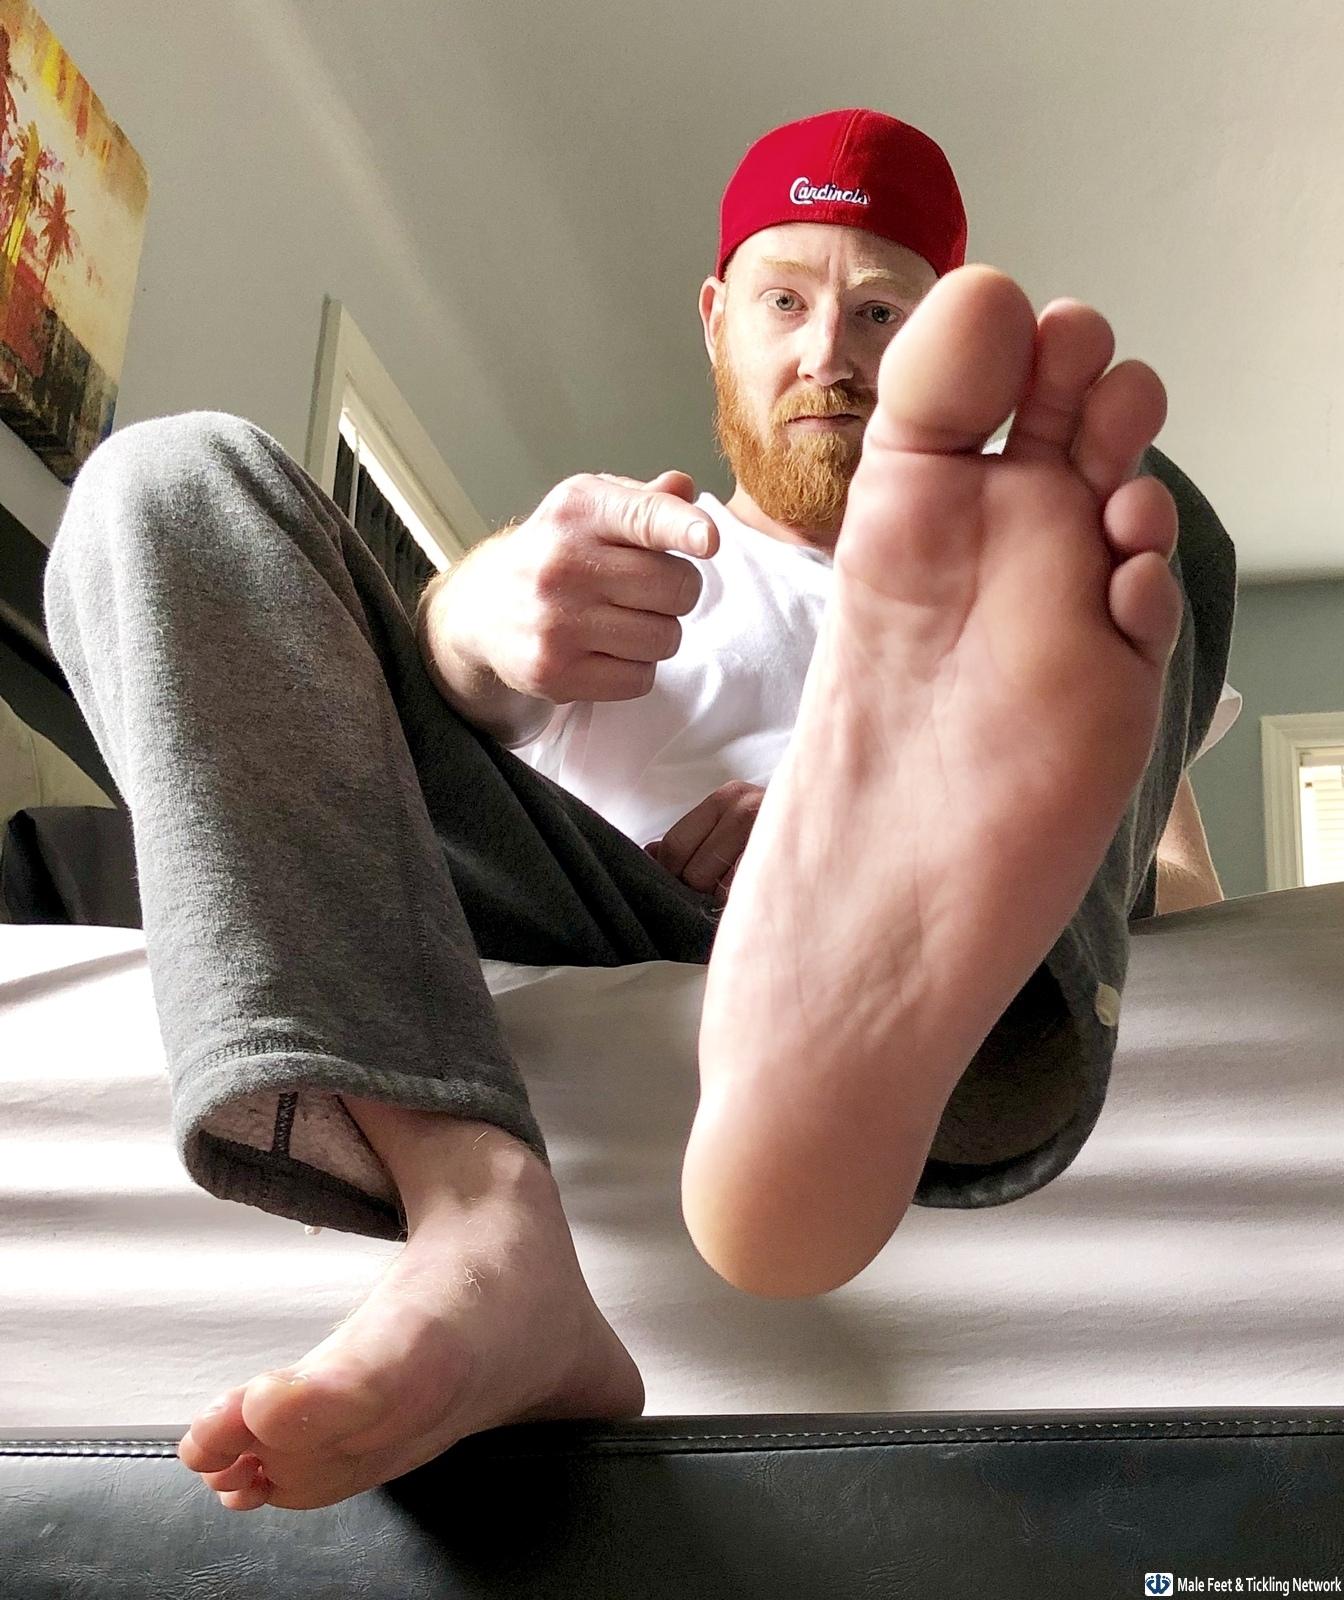 Male fetish sites